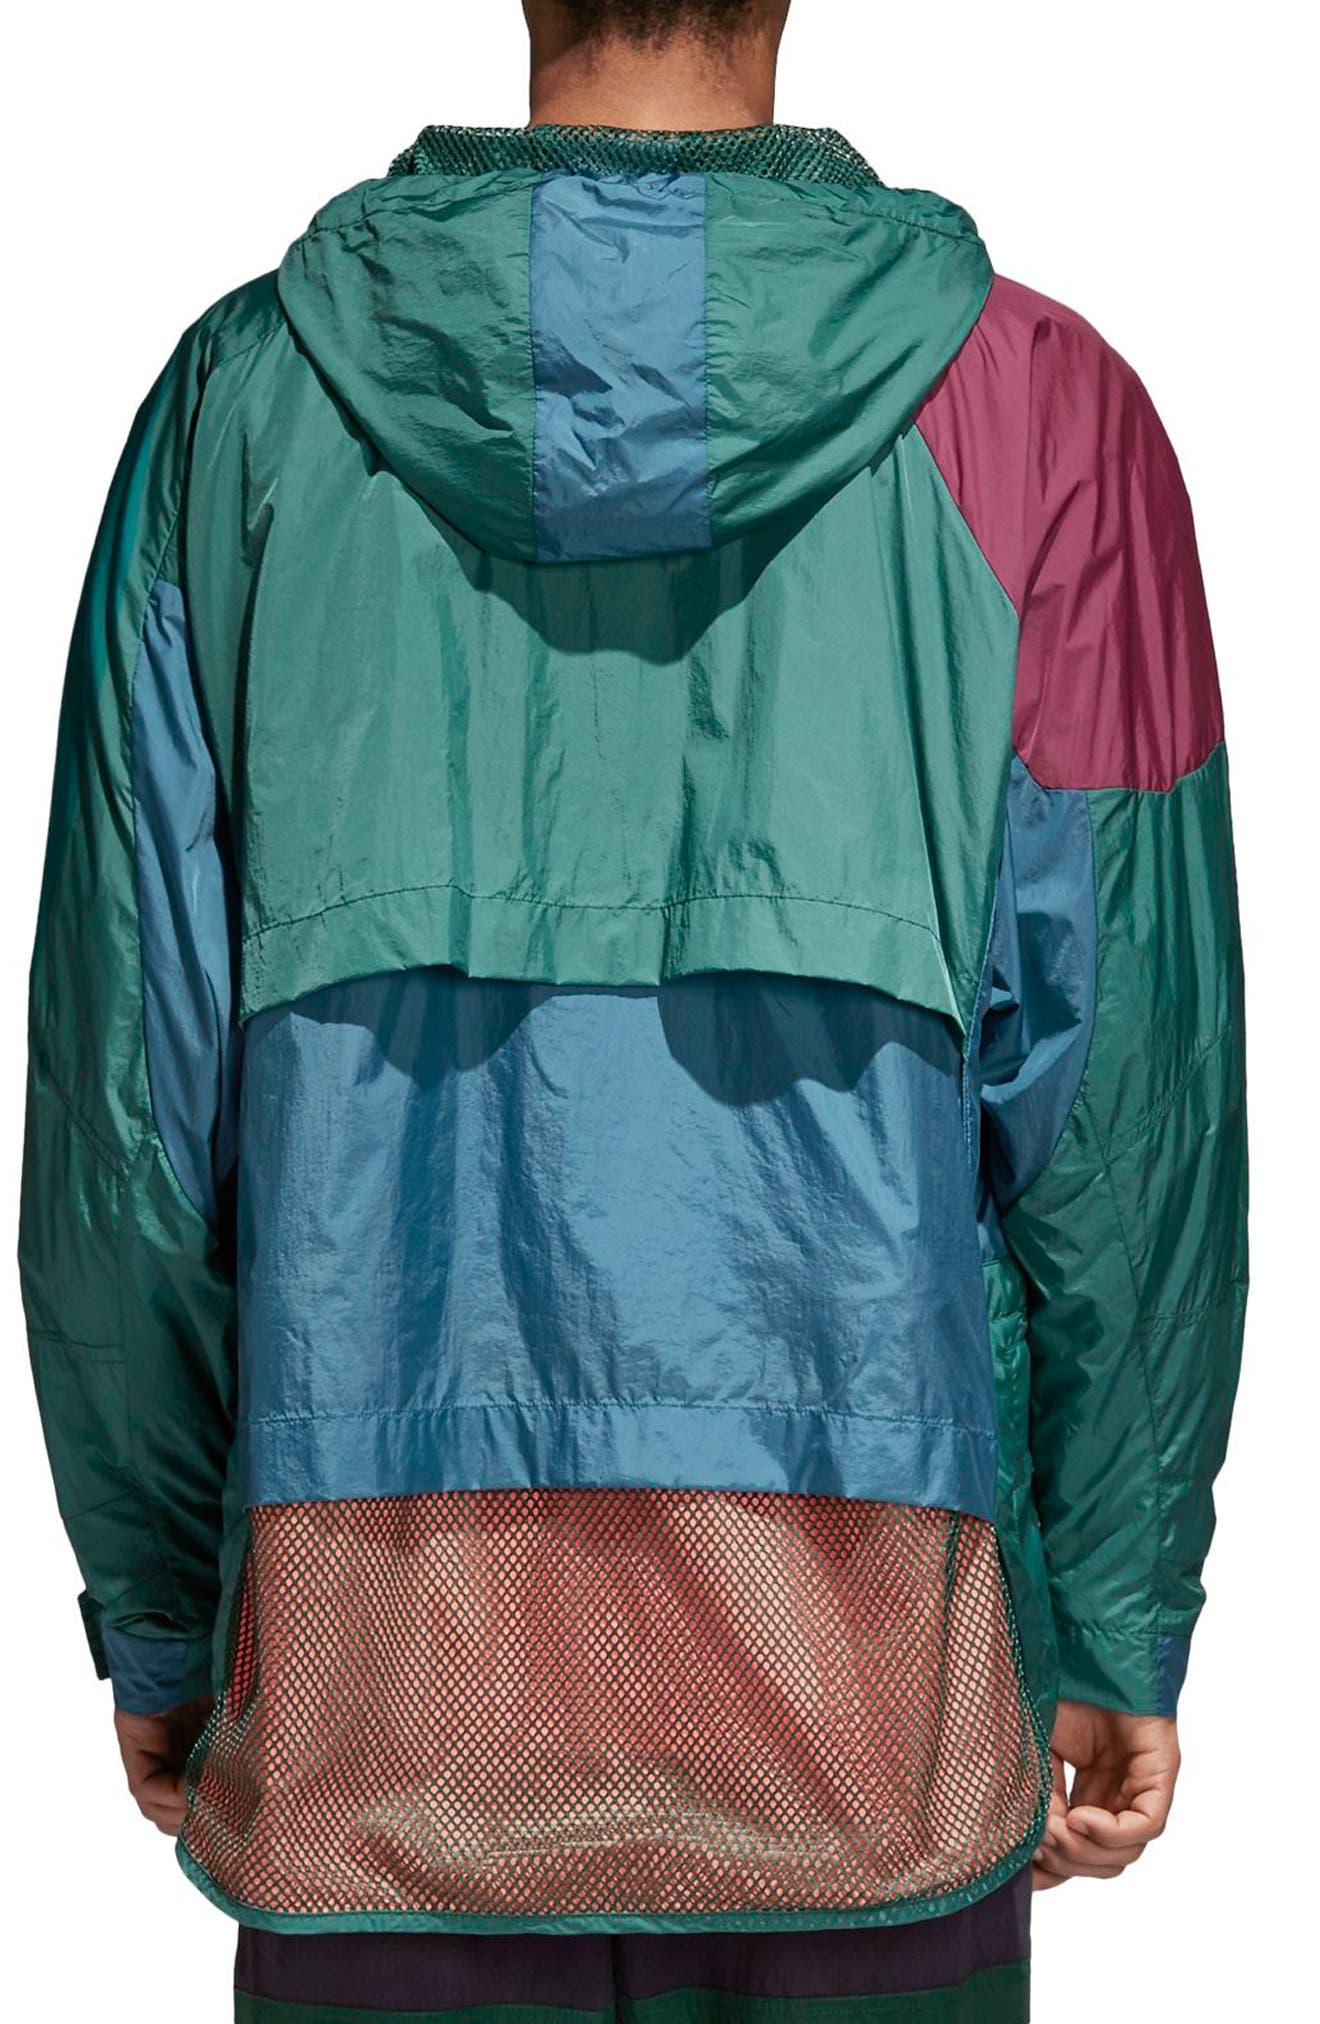 Vintage Jacket,                             Alternate thumbnail 2, color,                             305